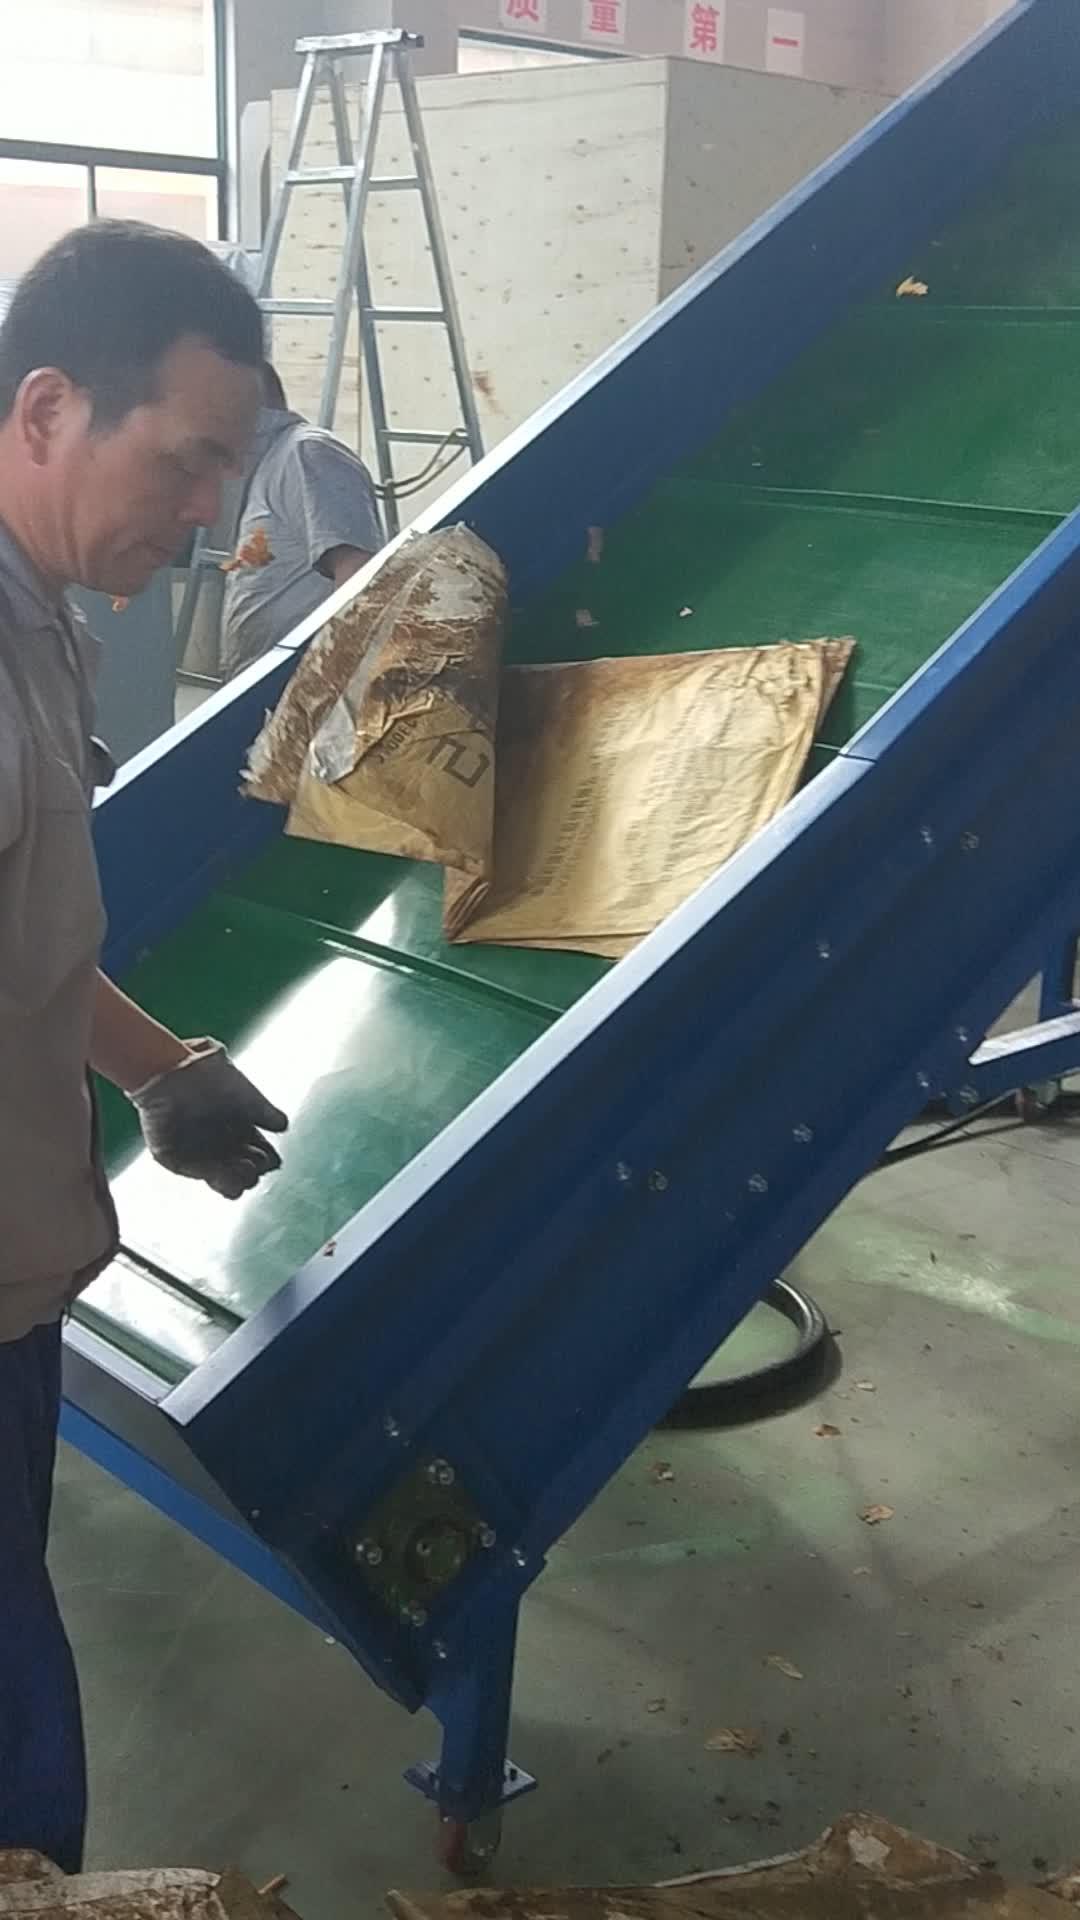 Two shaft Shredder for film CF-TS series plastic shredder machine used in industry